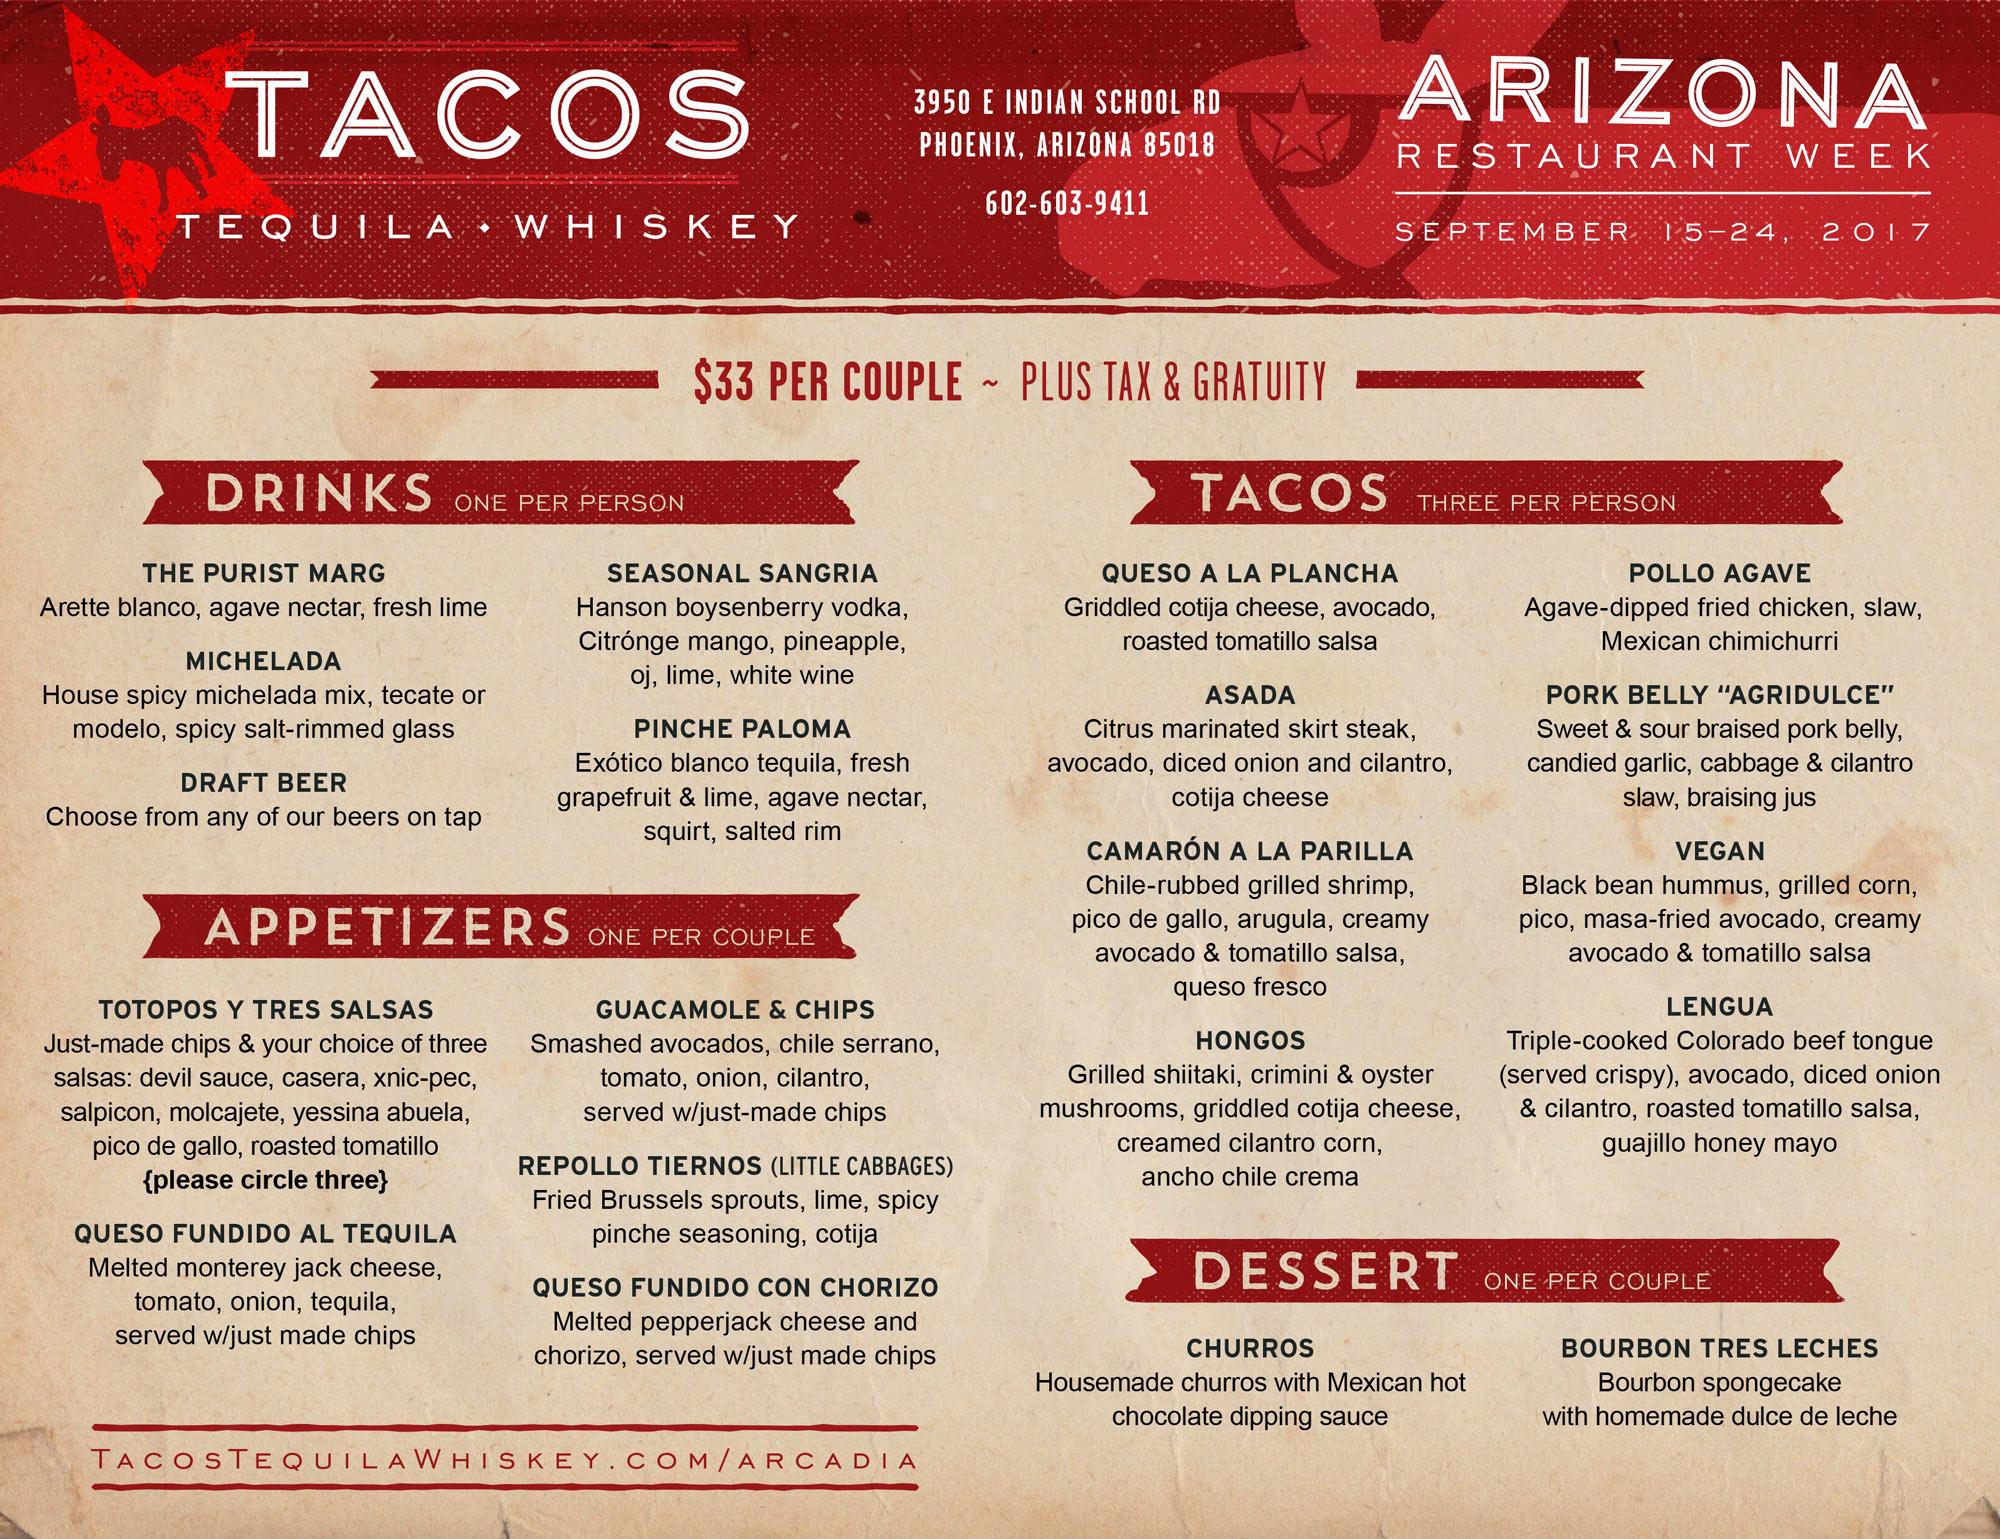 moderne gastronomie sch rzen 96 honda civic ac wiring diagram az restaurant week sept 15 24 tacos tequila whiskey modern